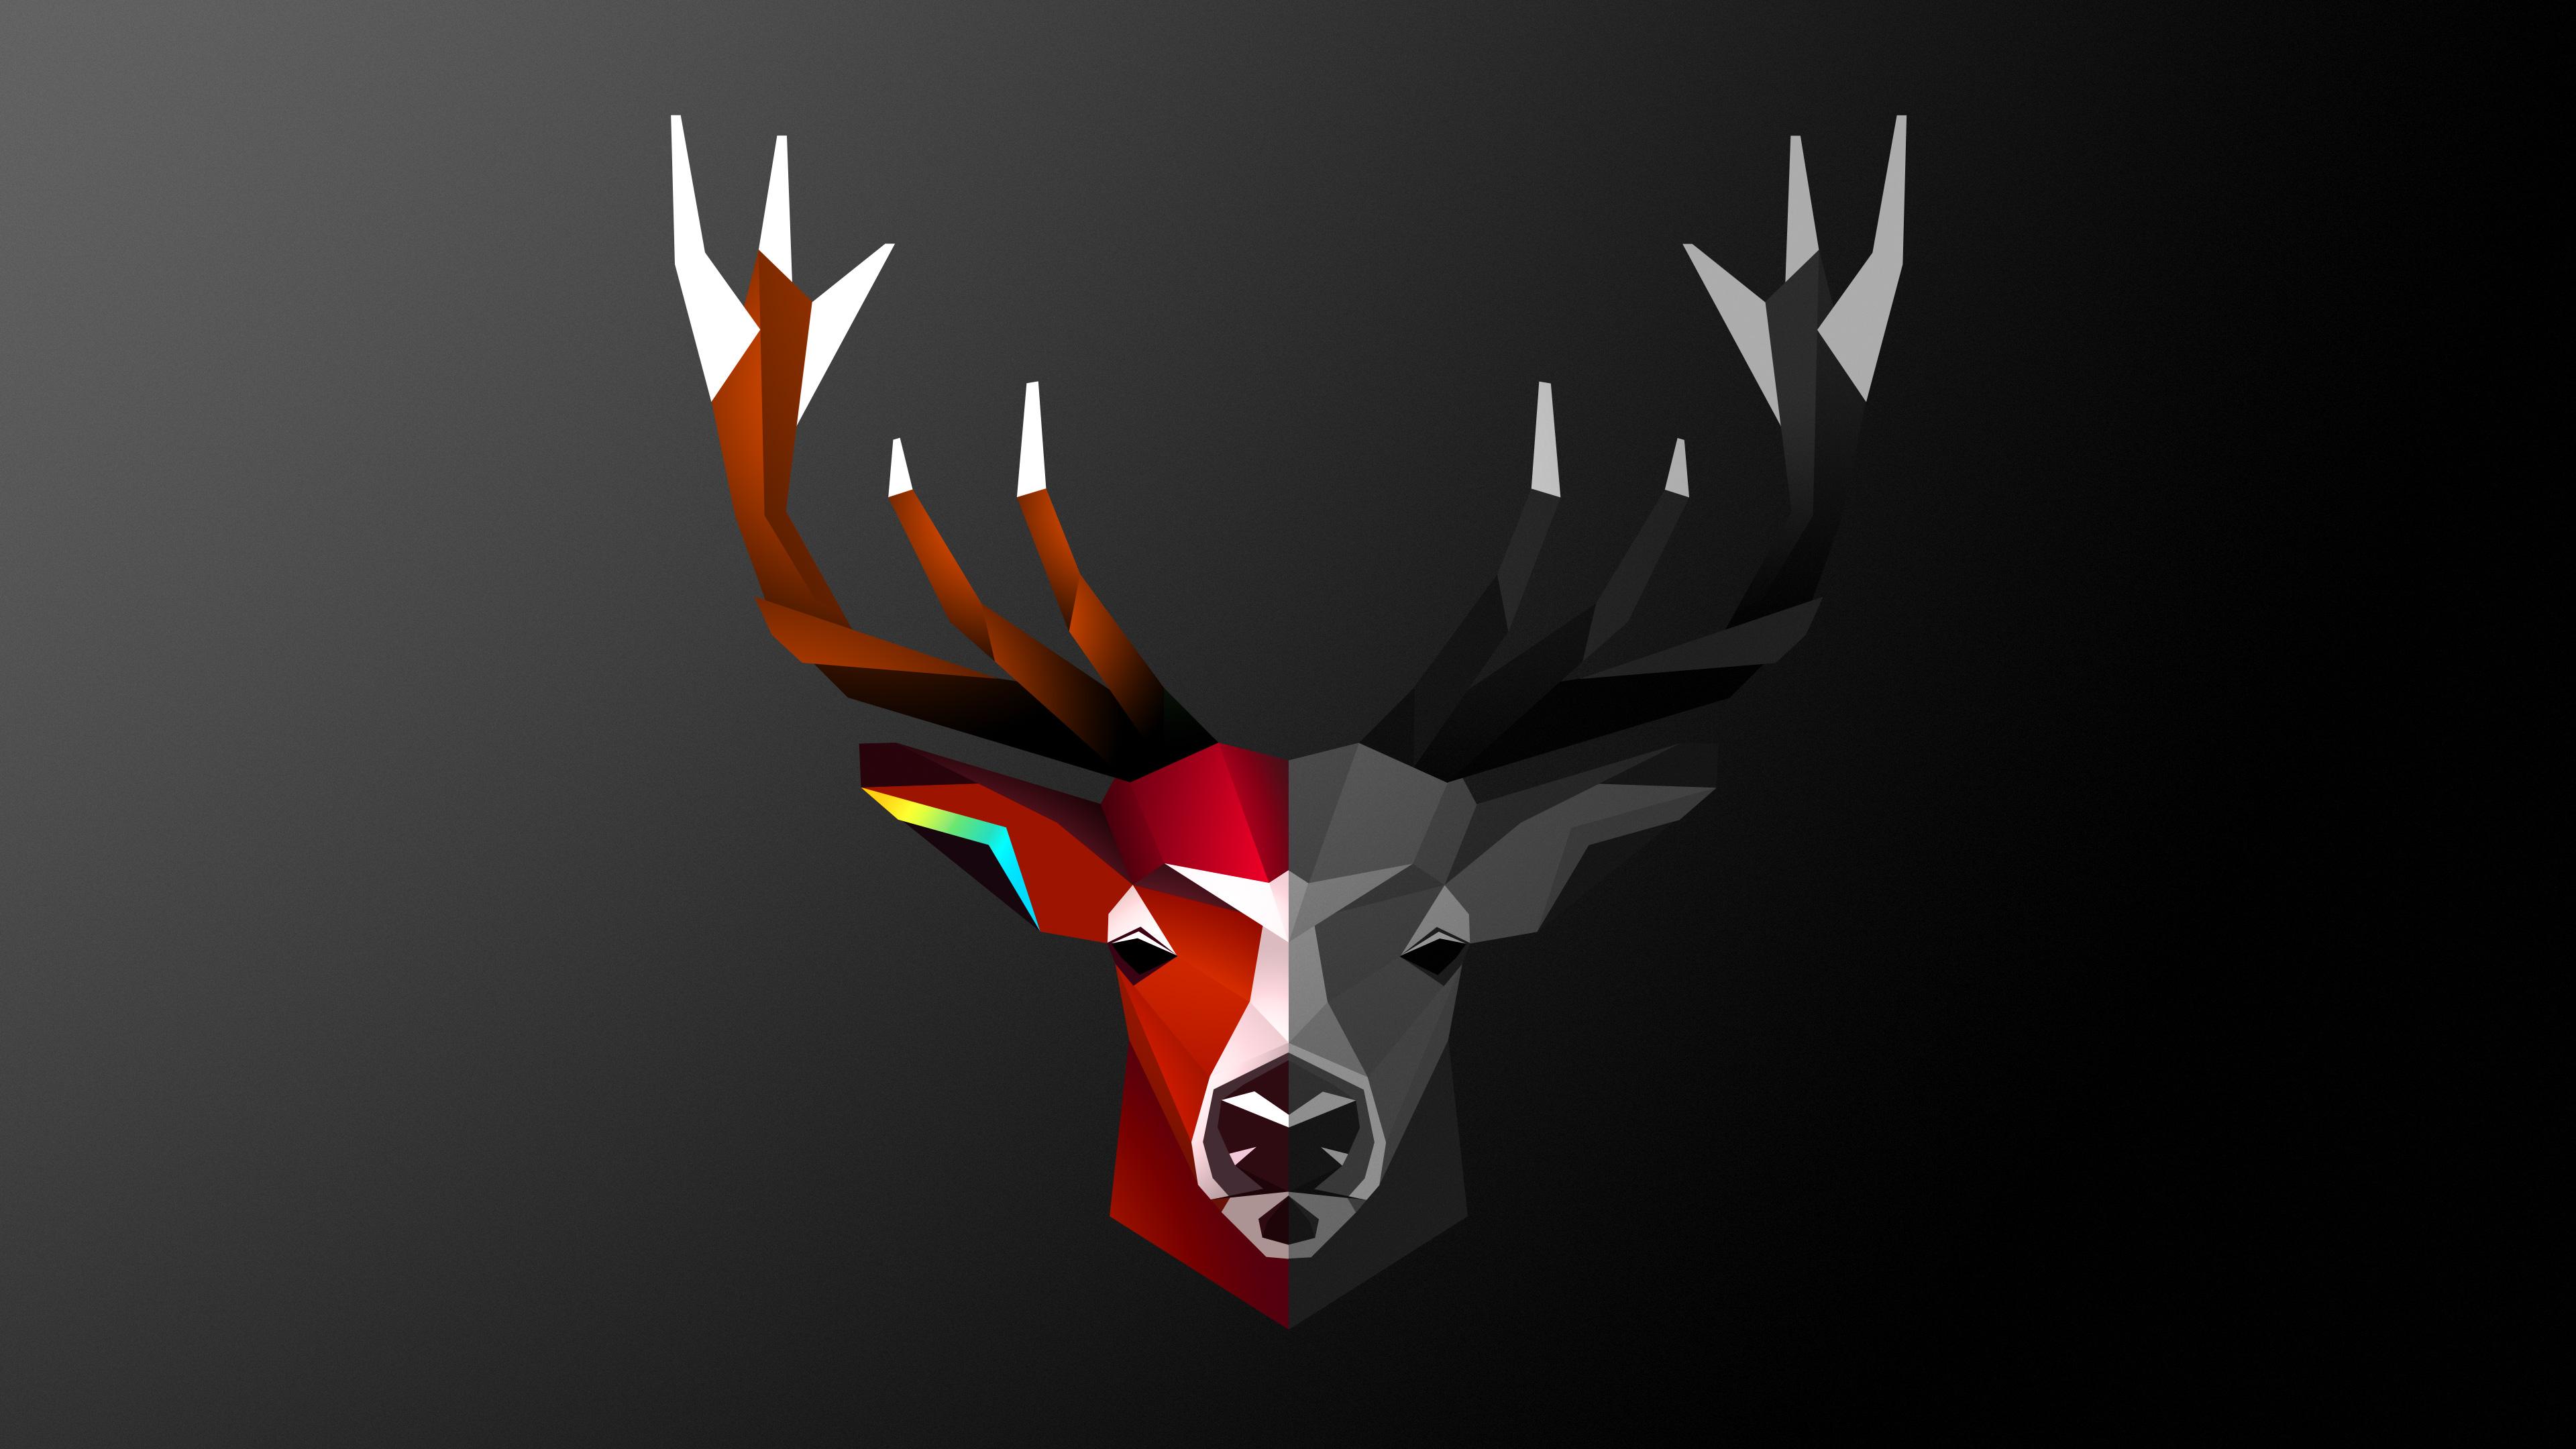 2560x1440 Abstract Deer 4k 1440P Resolution HD 4k